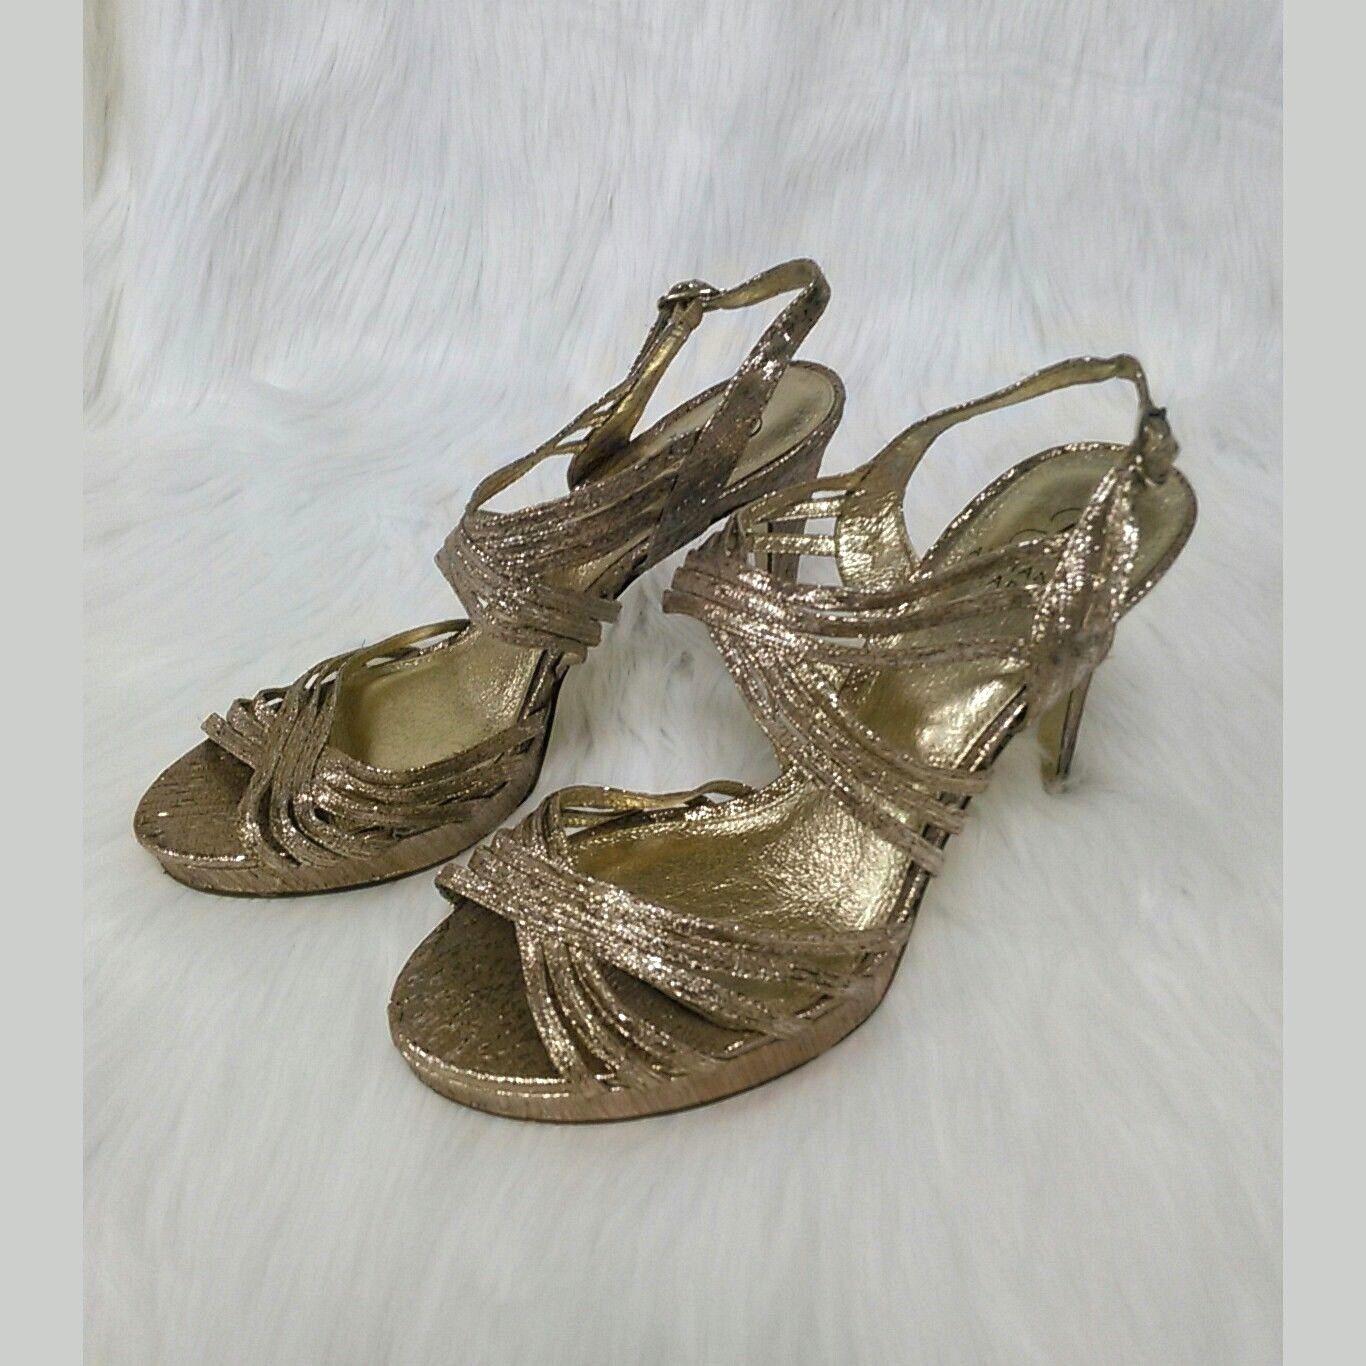 Adrianna Sandals Papell Womens Sz 9 Sandals Adrianna Heels Aiden Gold Shimmer Strappy 4